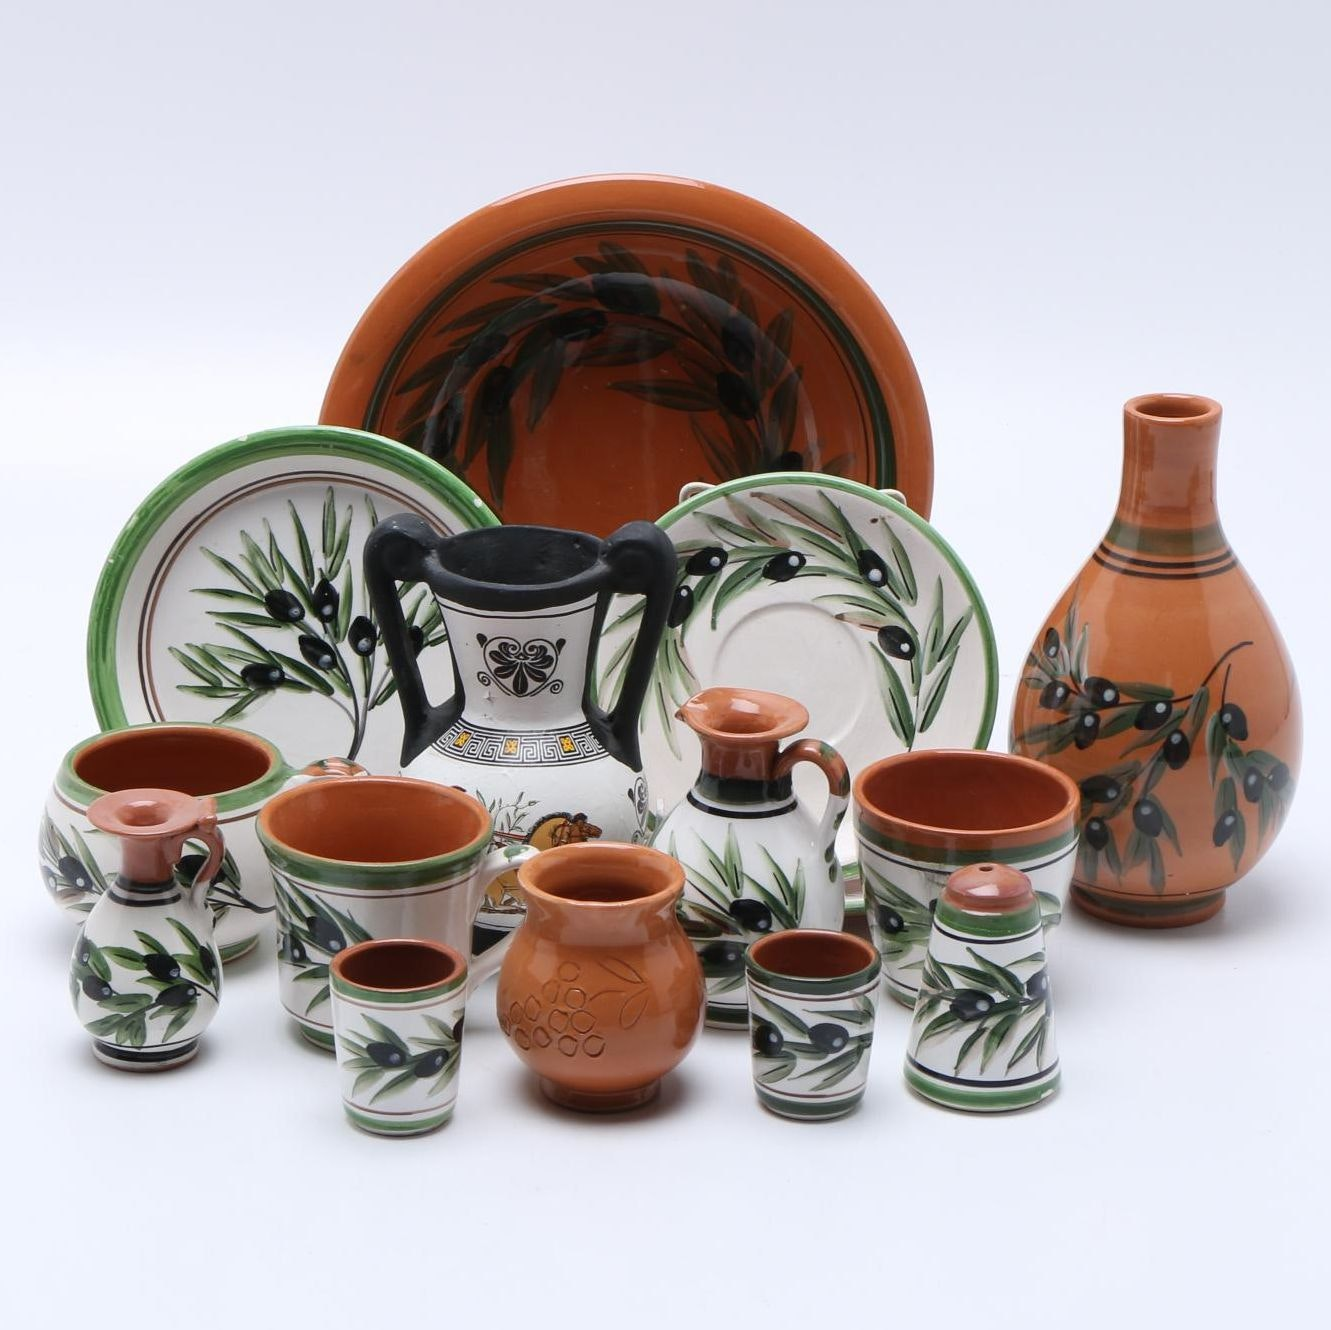 Hand-Painted Greek Ceramic Tableware ... & Hand-Painted Greek Ceramic Tableware : EBTH